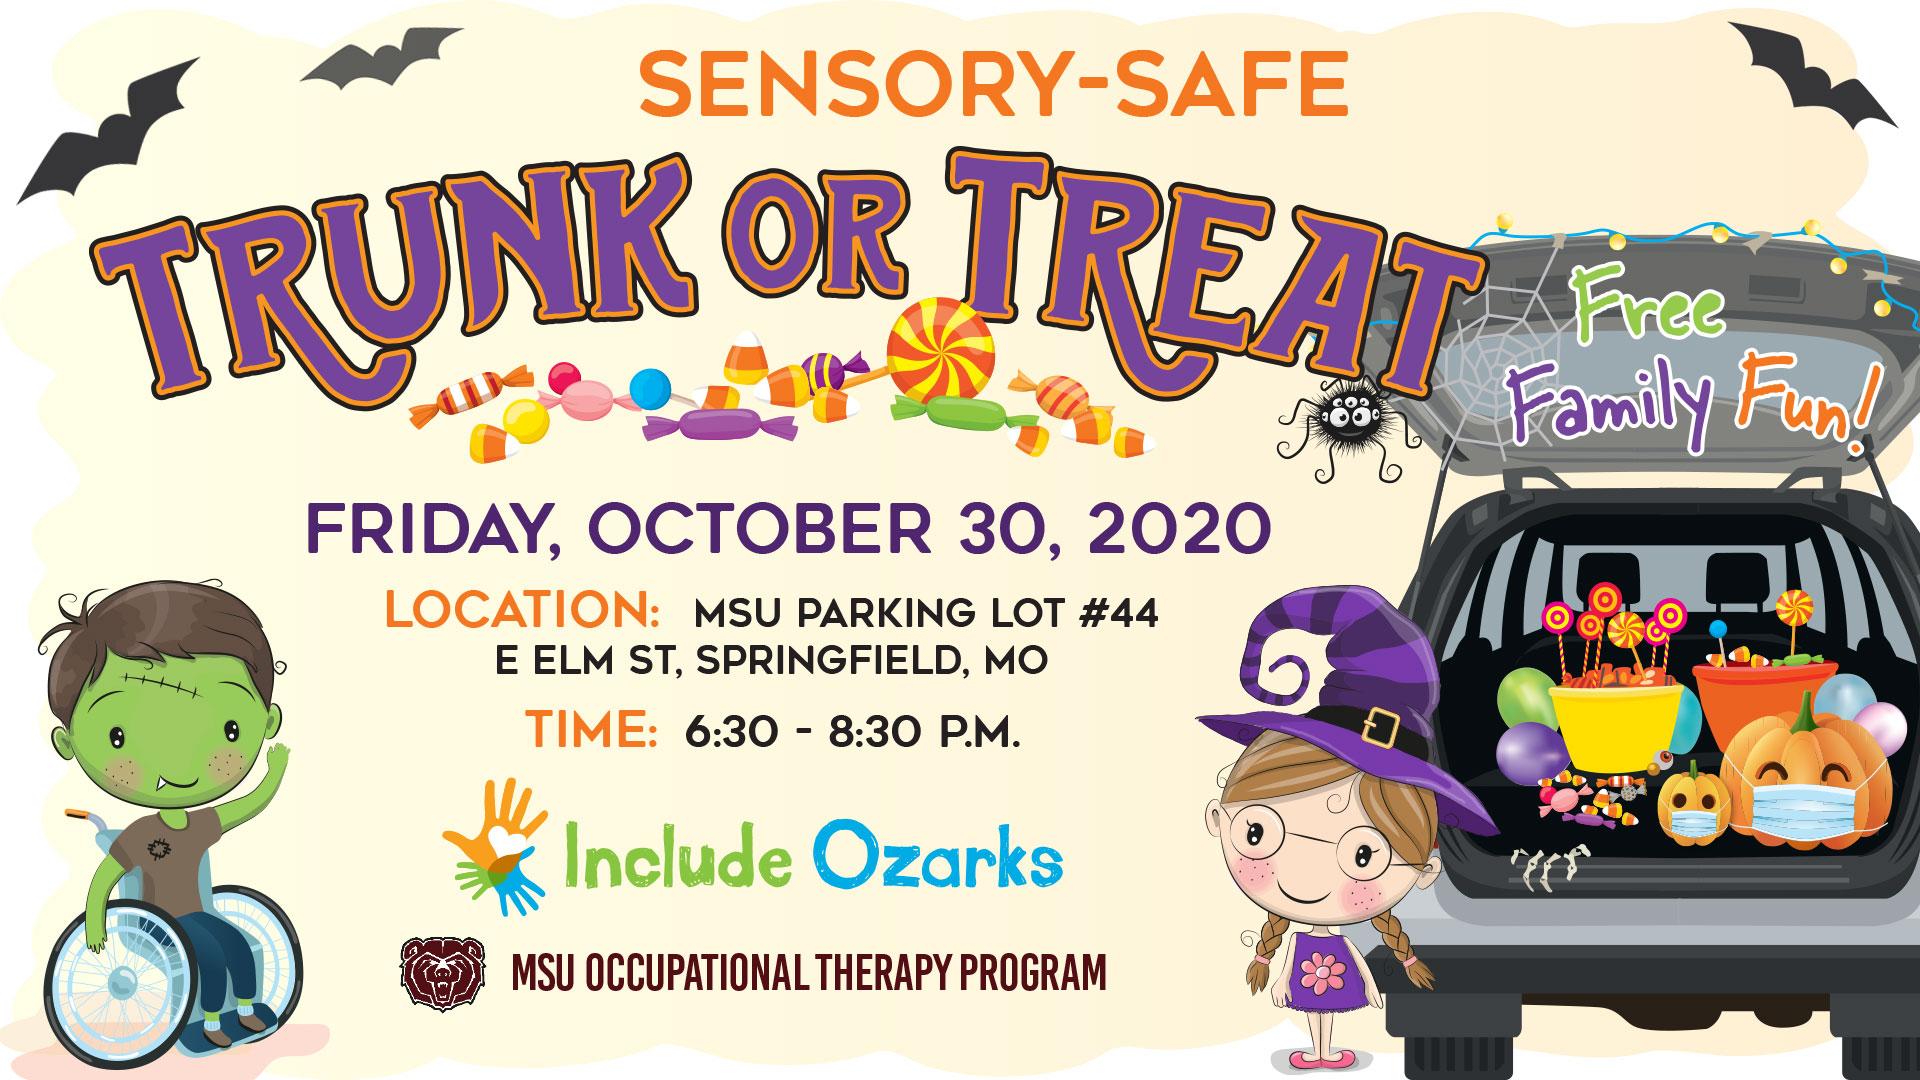 Sensory-safe Trunk or Treat: Friday, Oct. 30, MSU lot 44, 6:30-8:30 p,m,